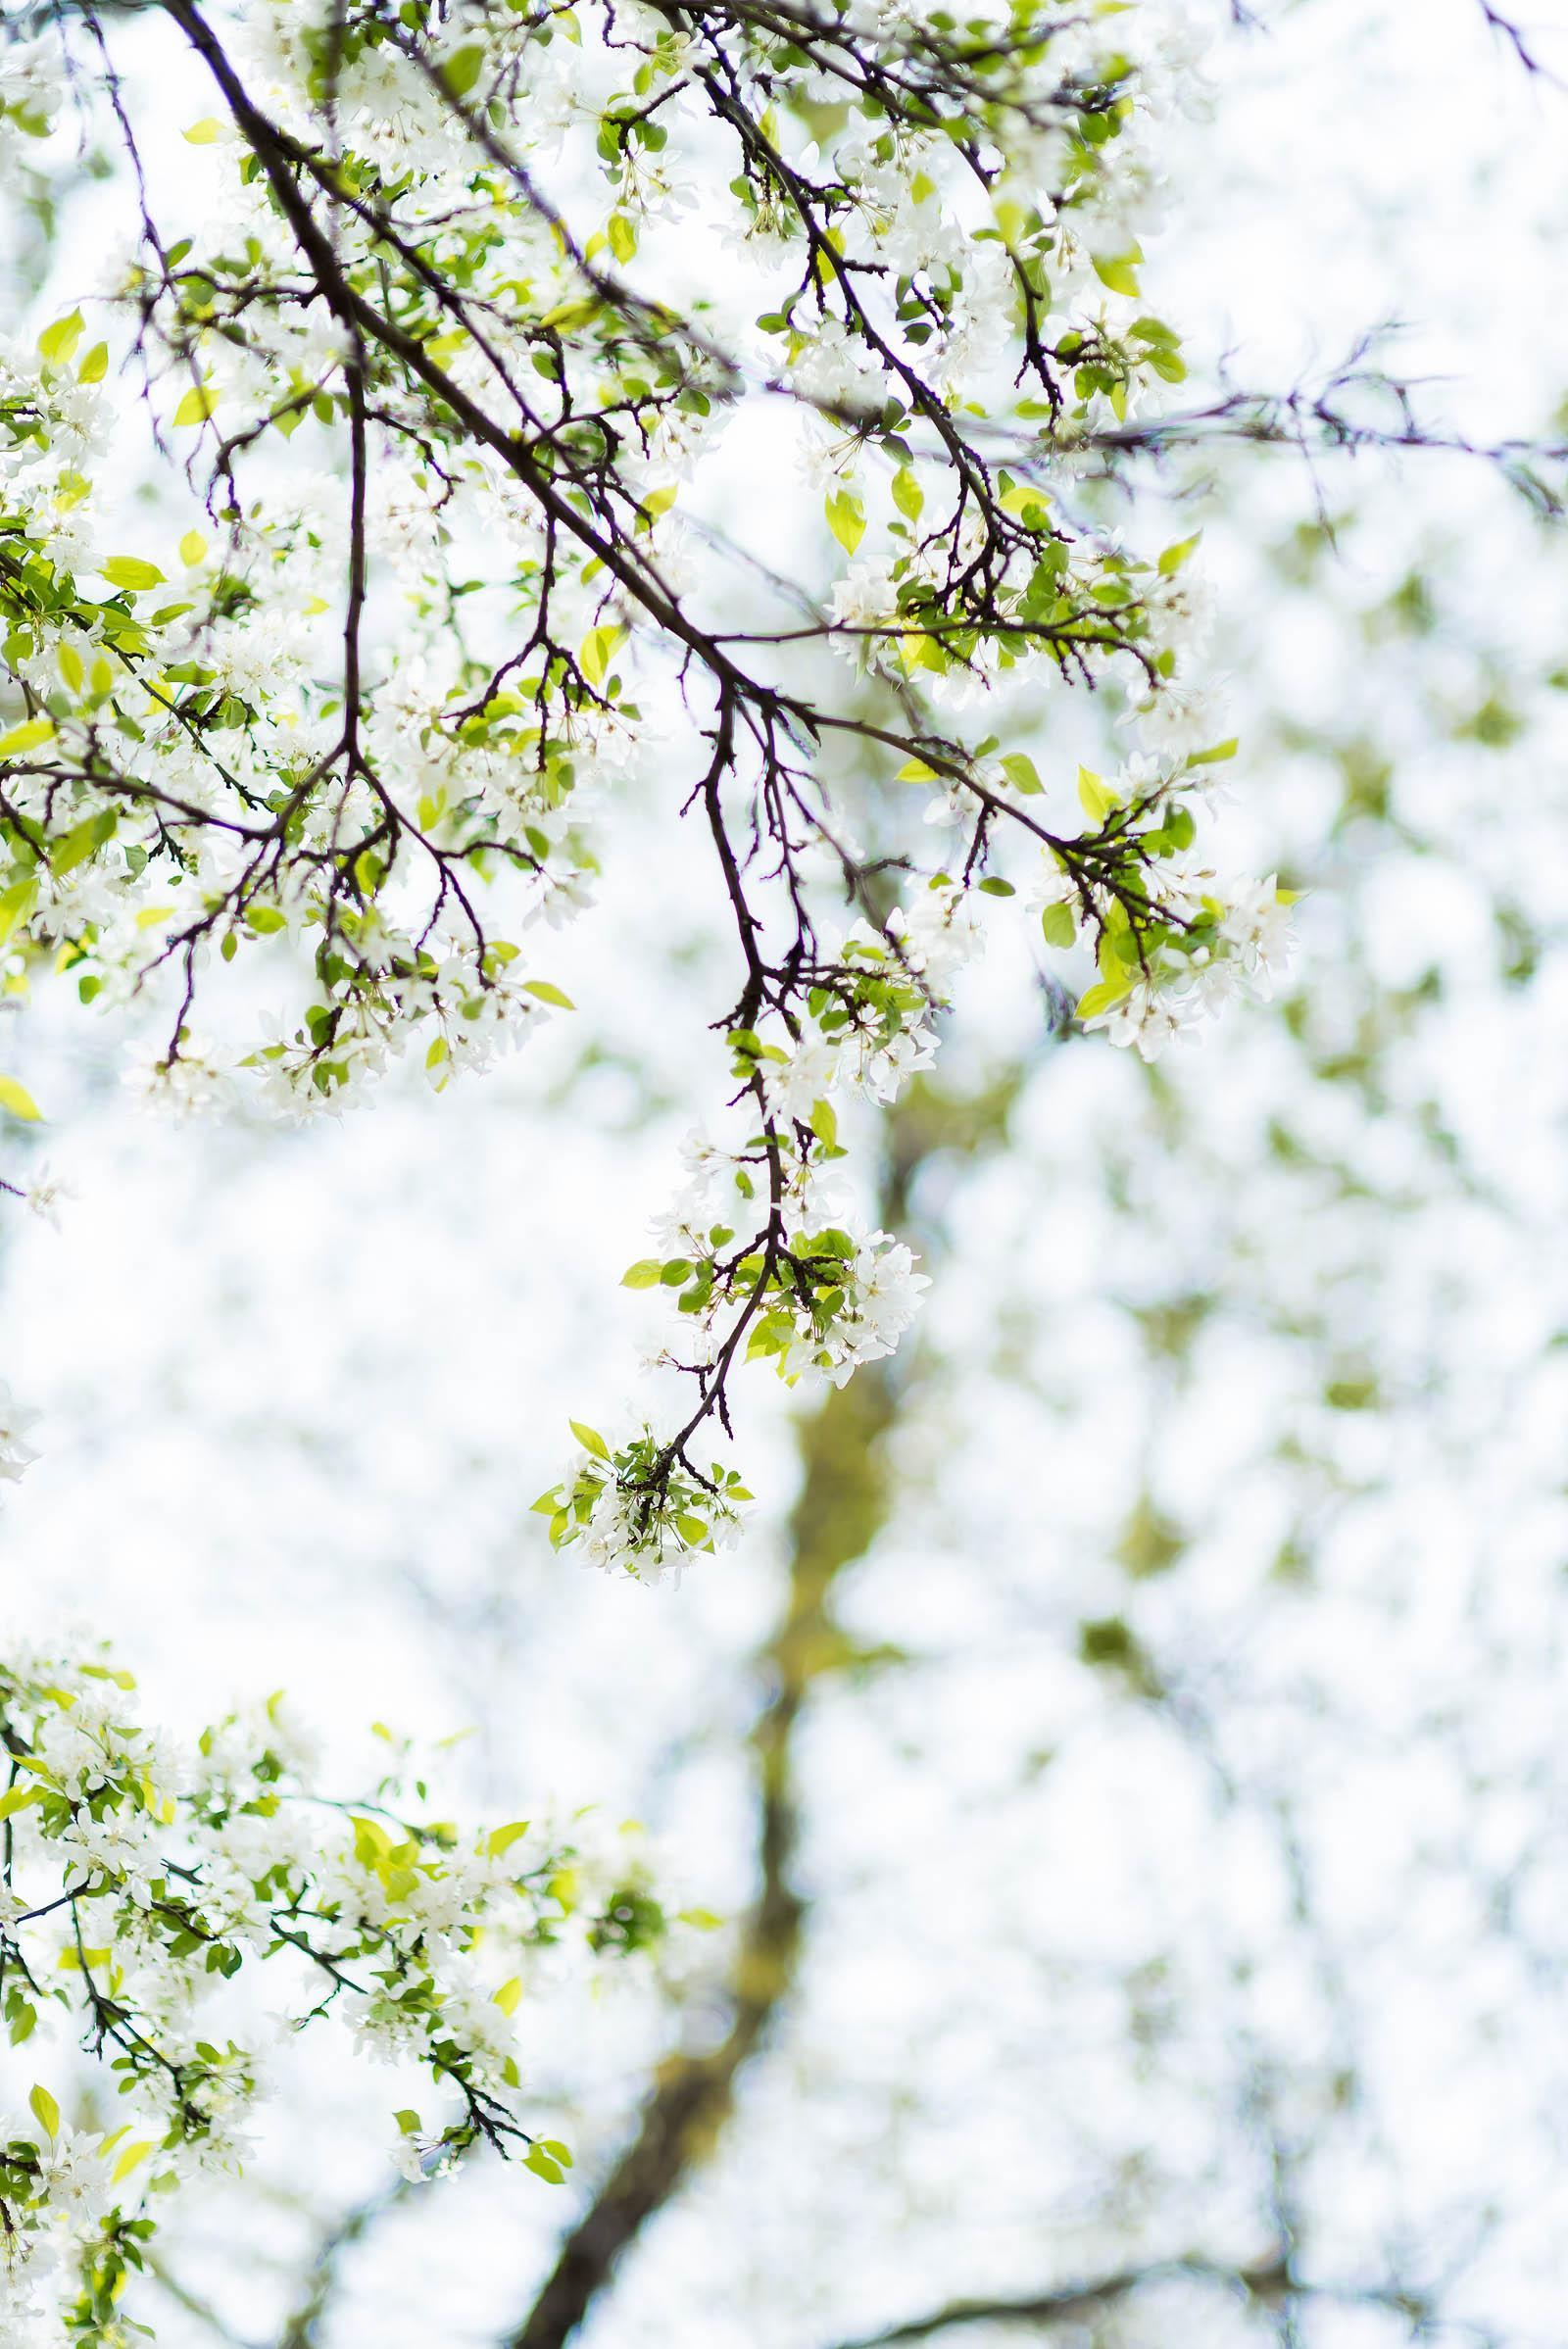 Chicago Spring Flowering Trees 2017